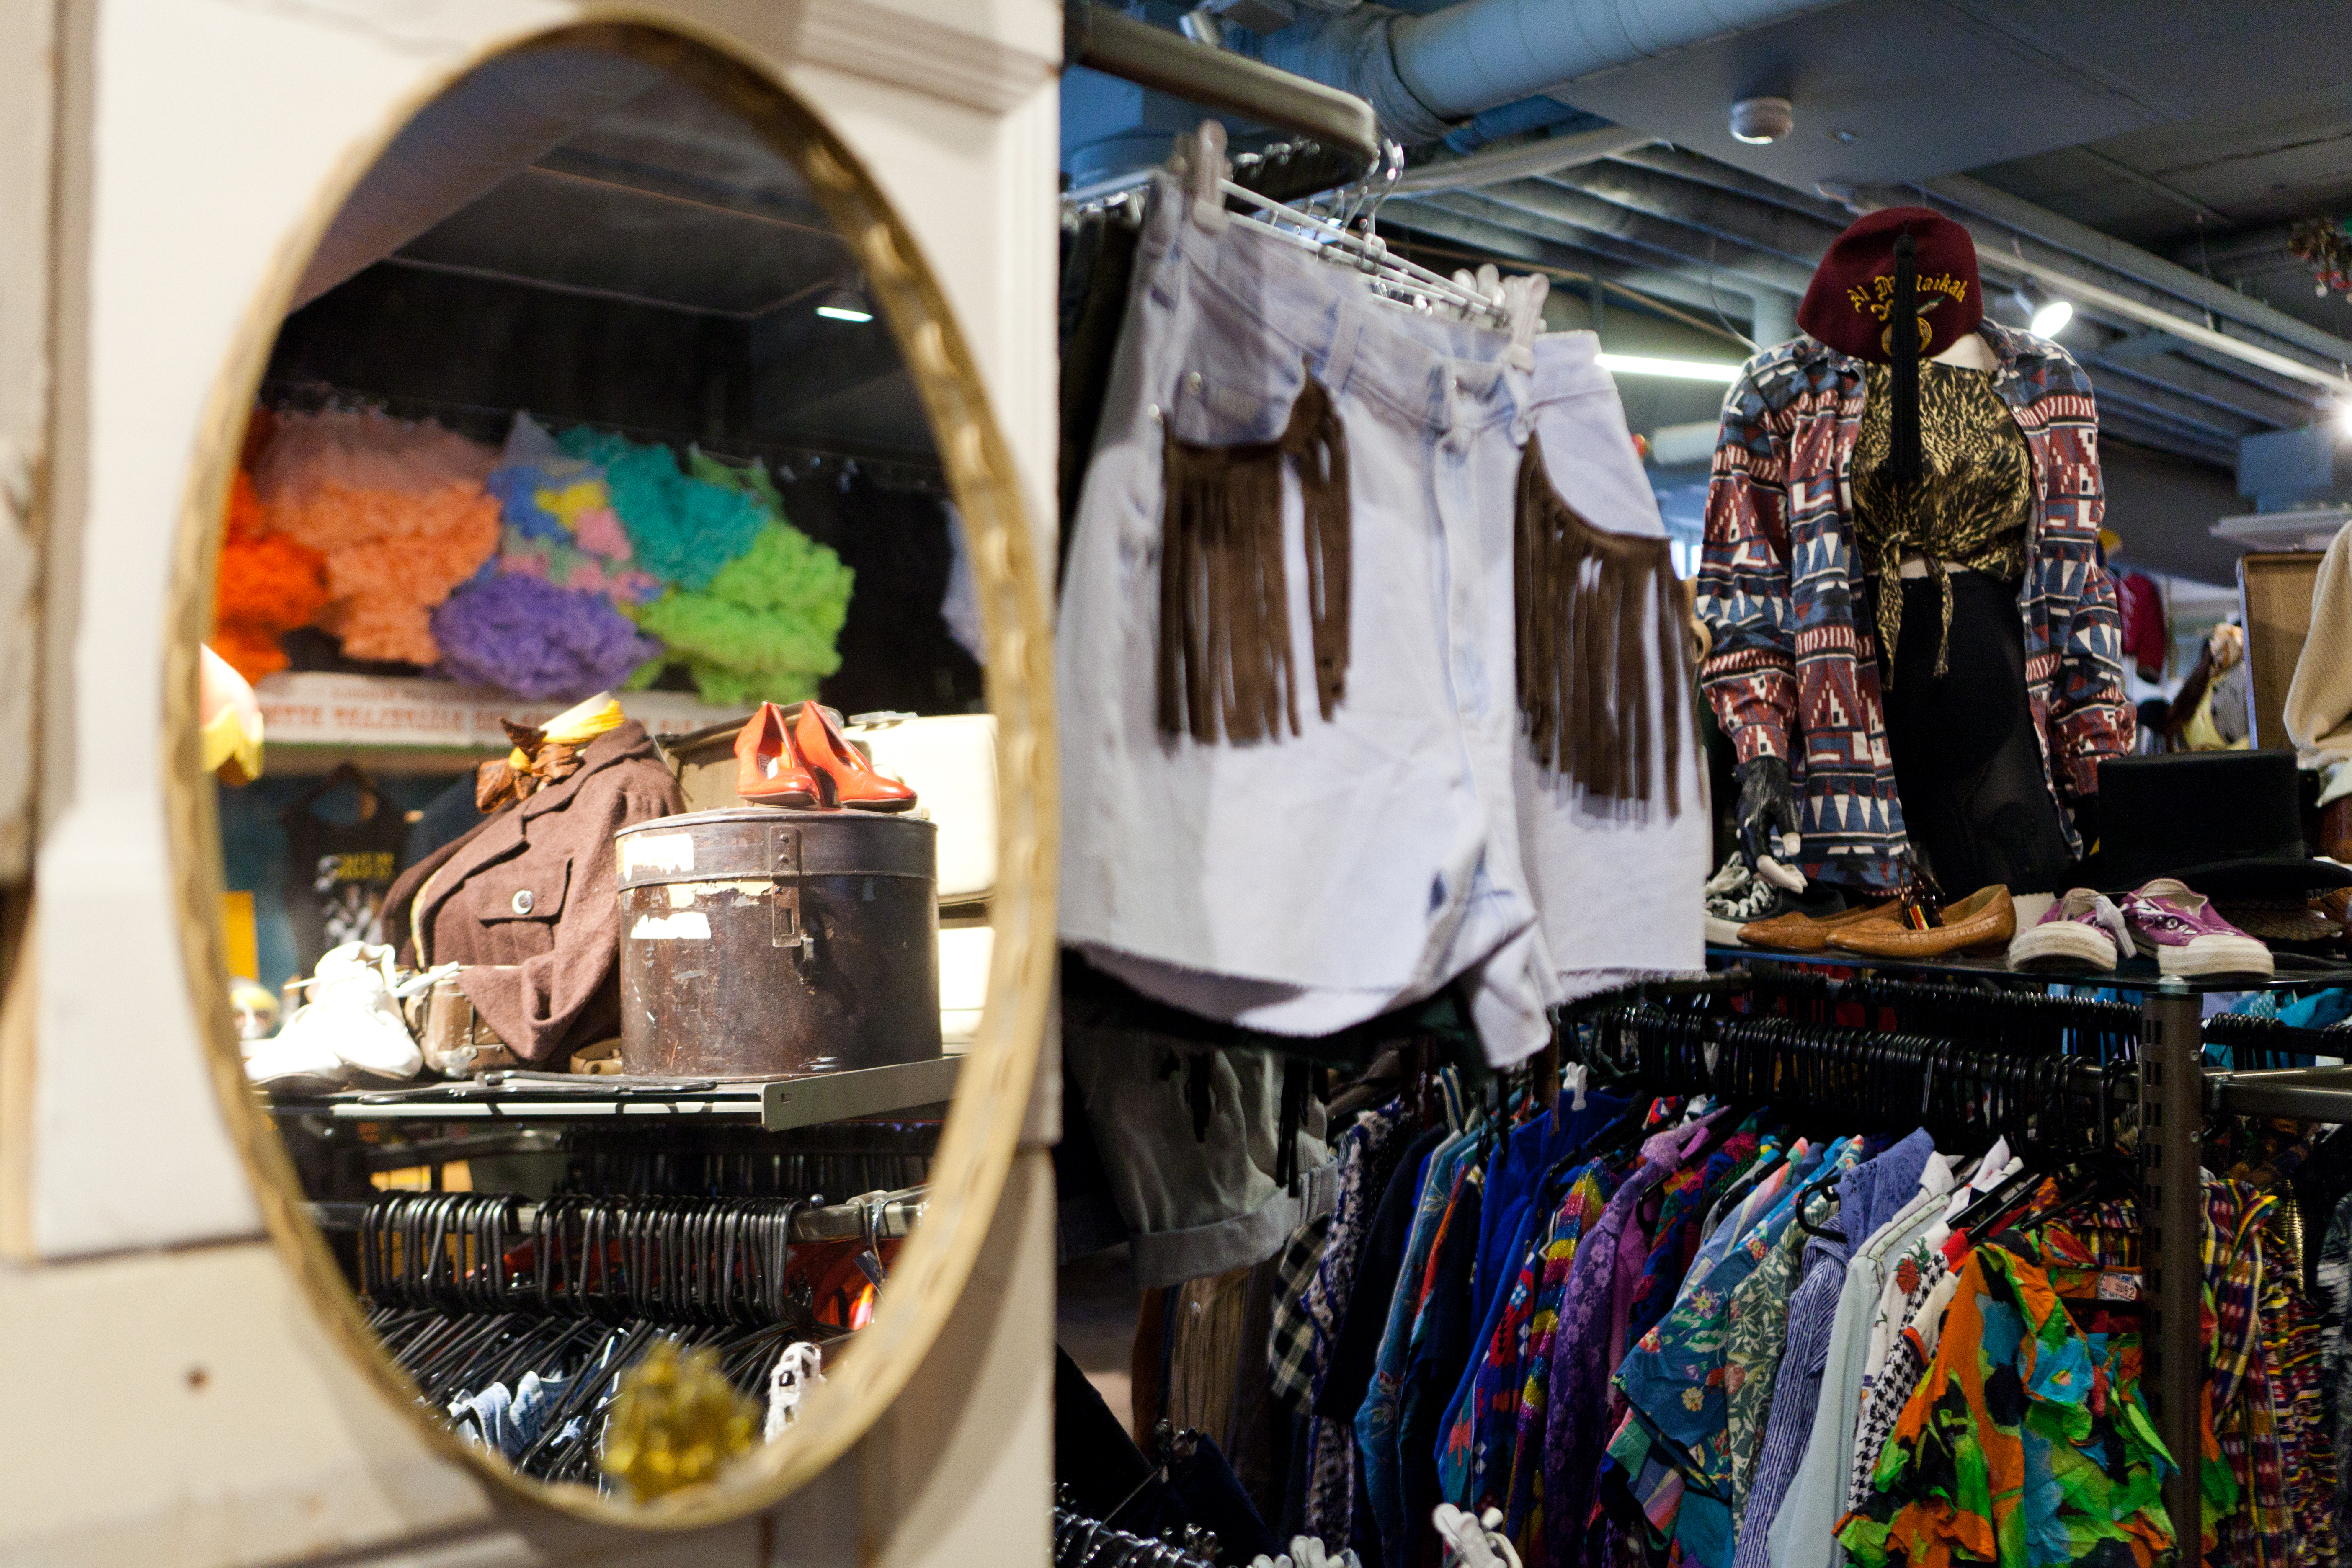 tuukka_ervasti-vintage_shopping-612